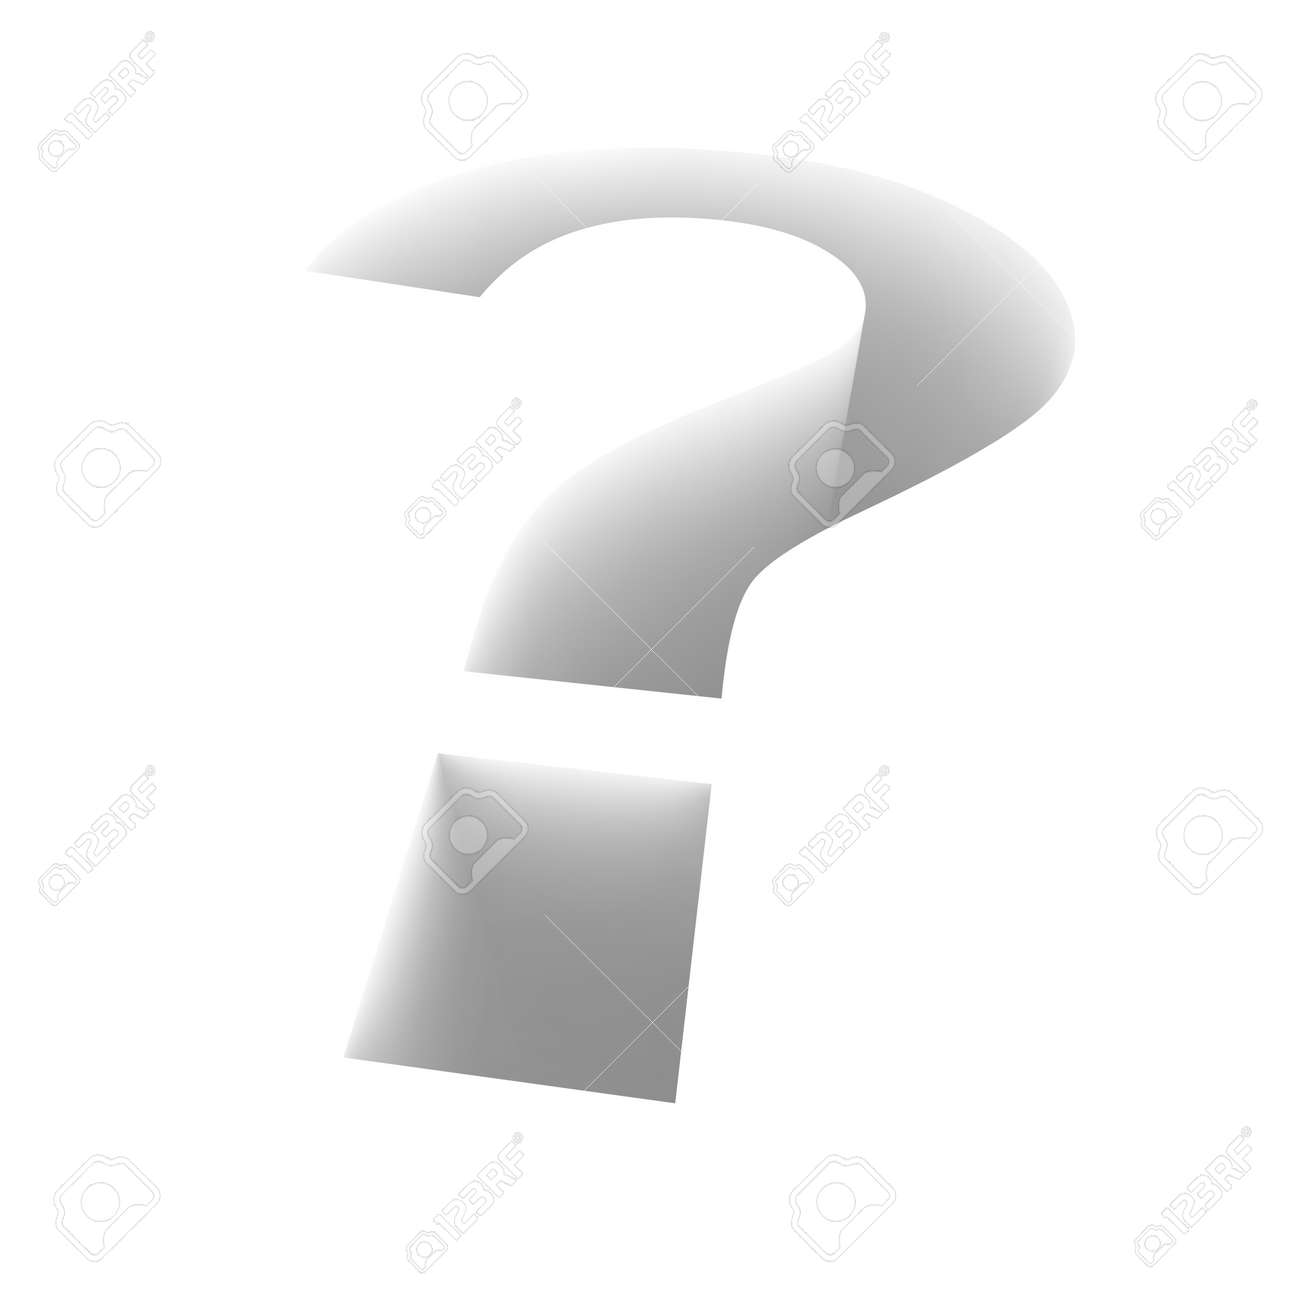 Extruded question mark. 3d rendered illustration. Stock Illustration - 7438121